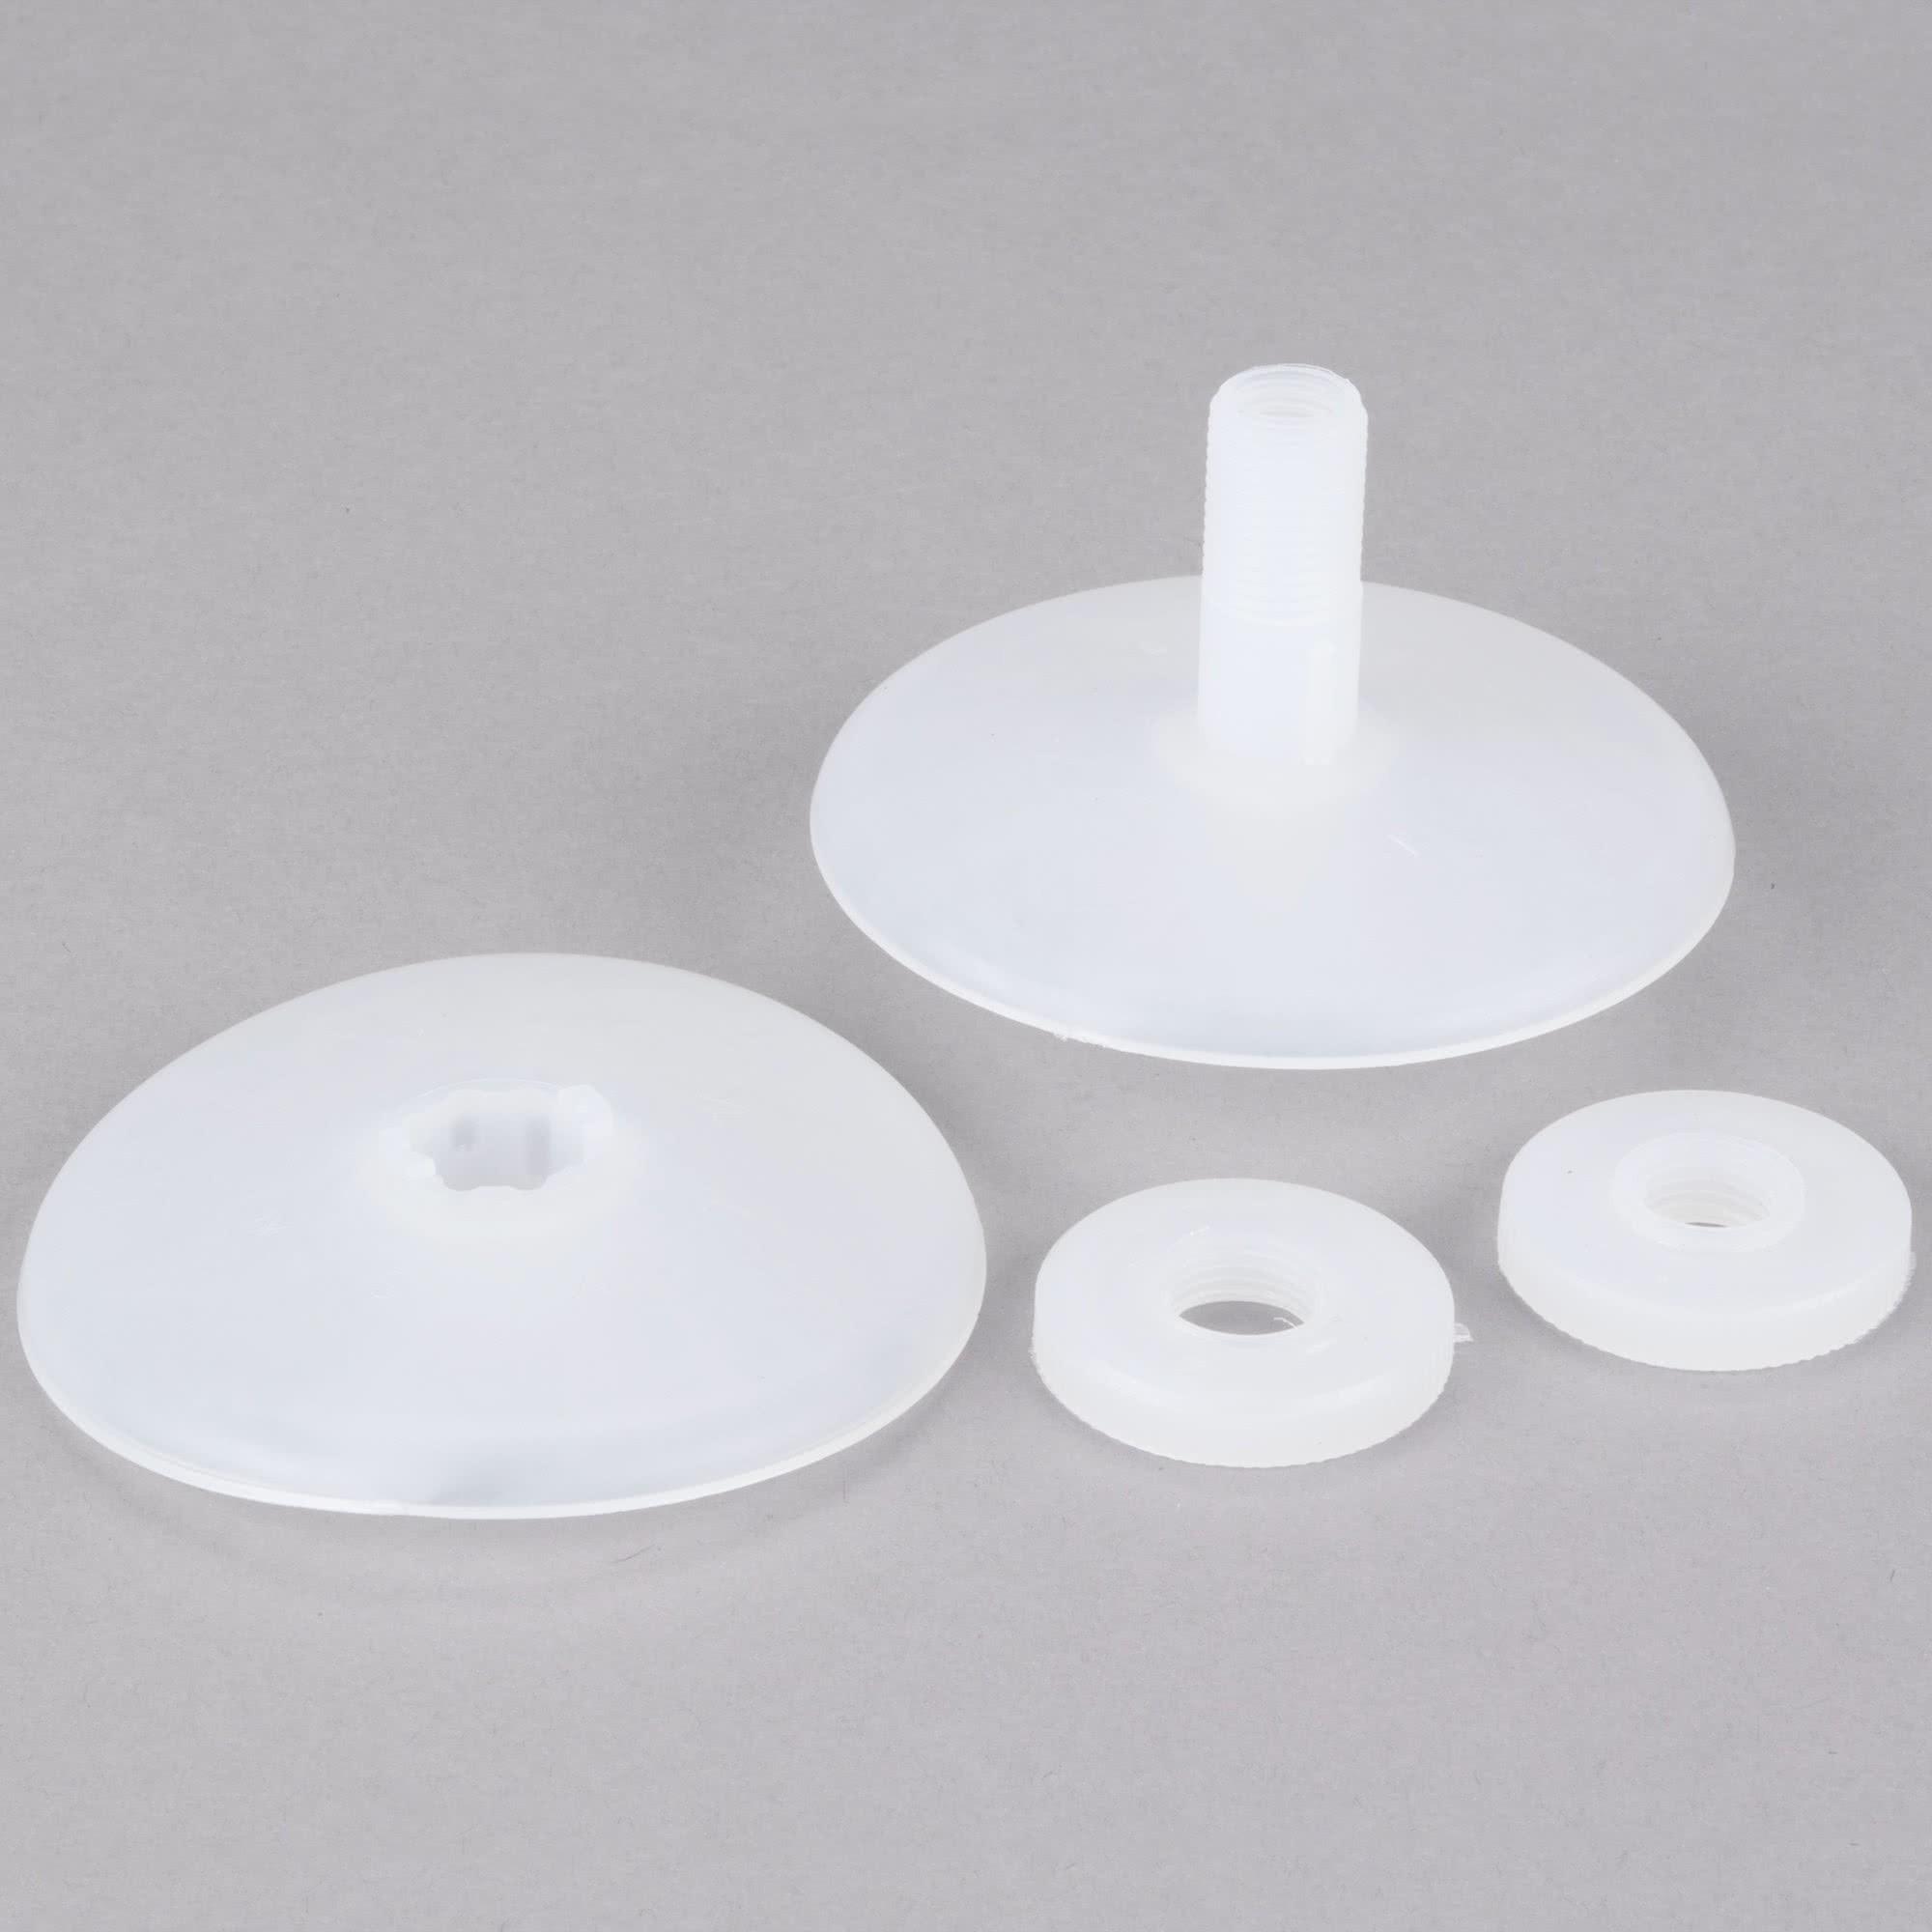 Nemco 56014 Feeder Discs Set with Nuts for Nemco ShrimpPro